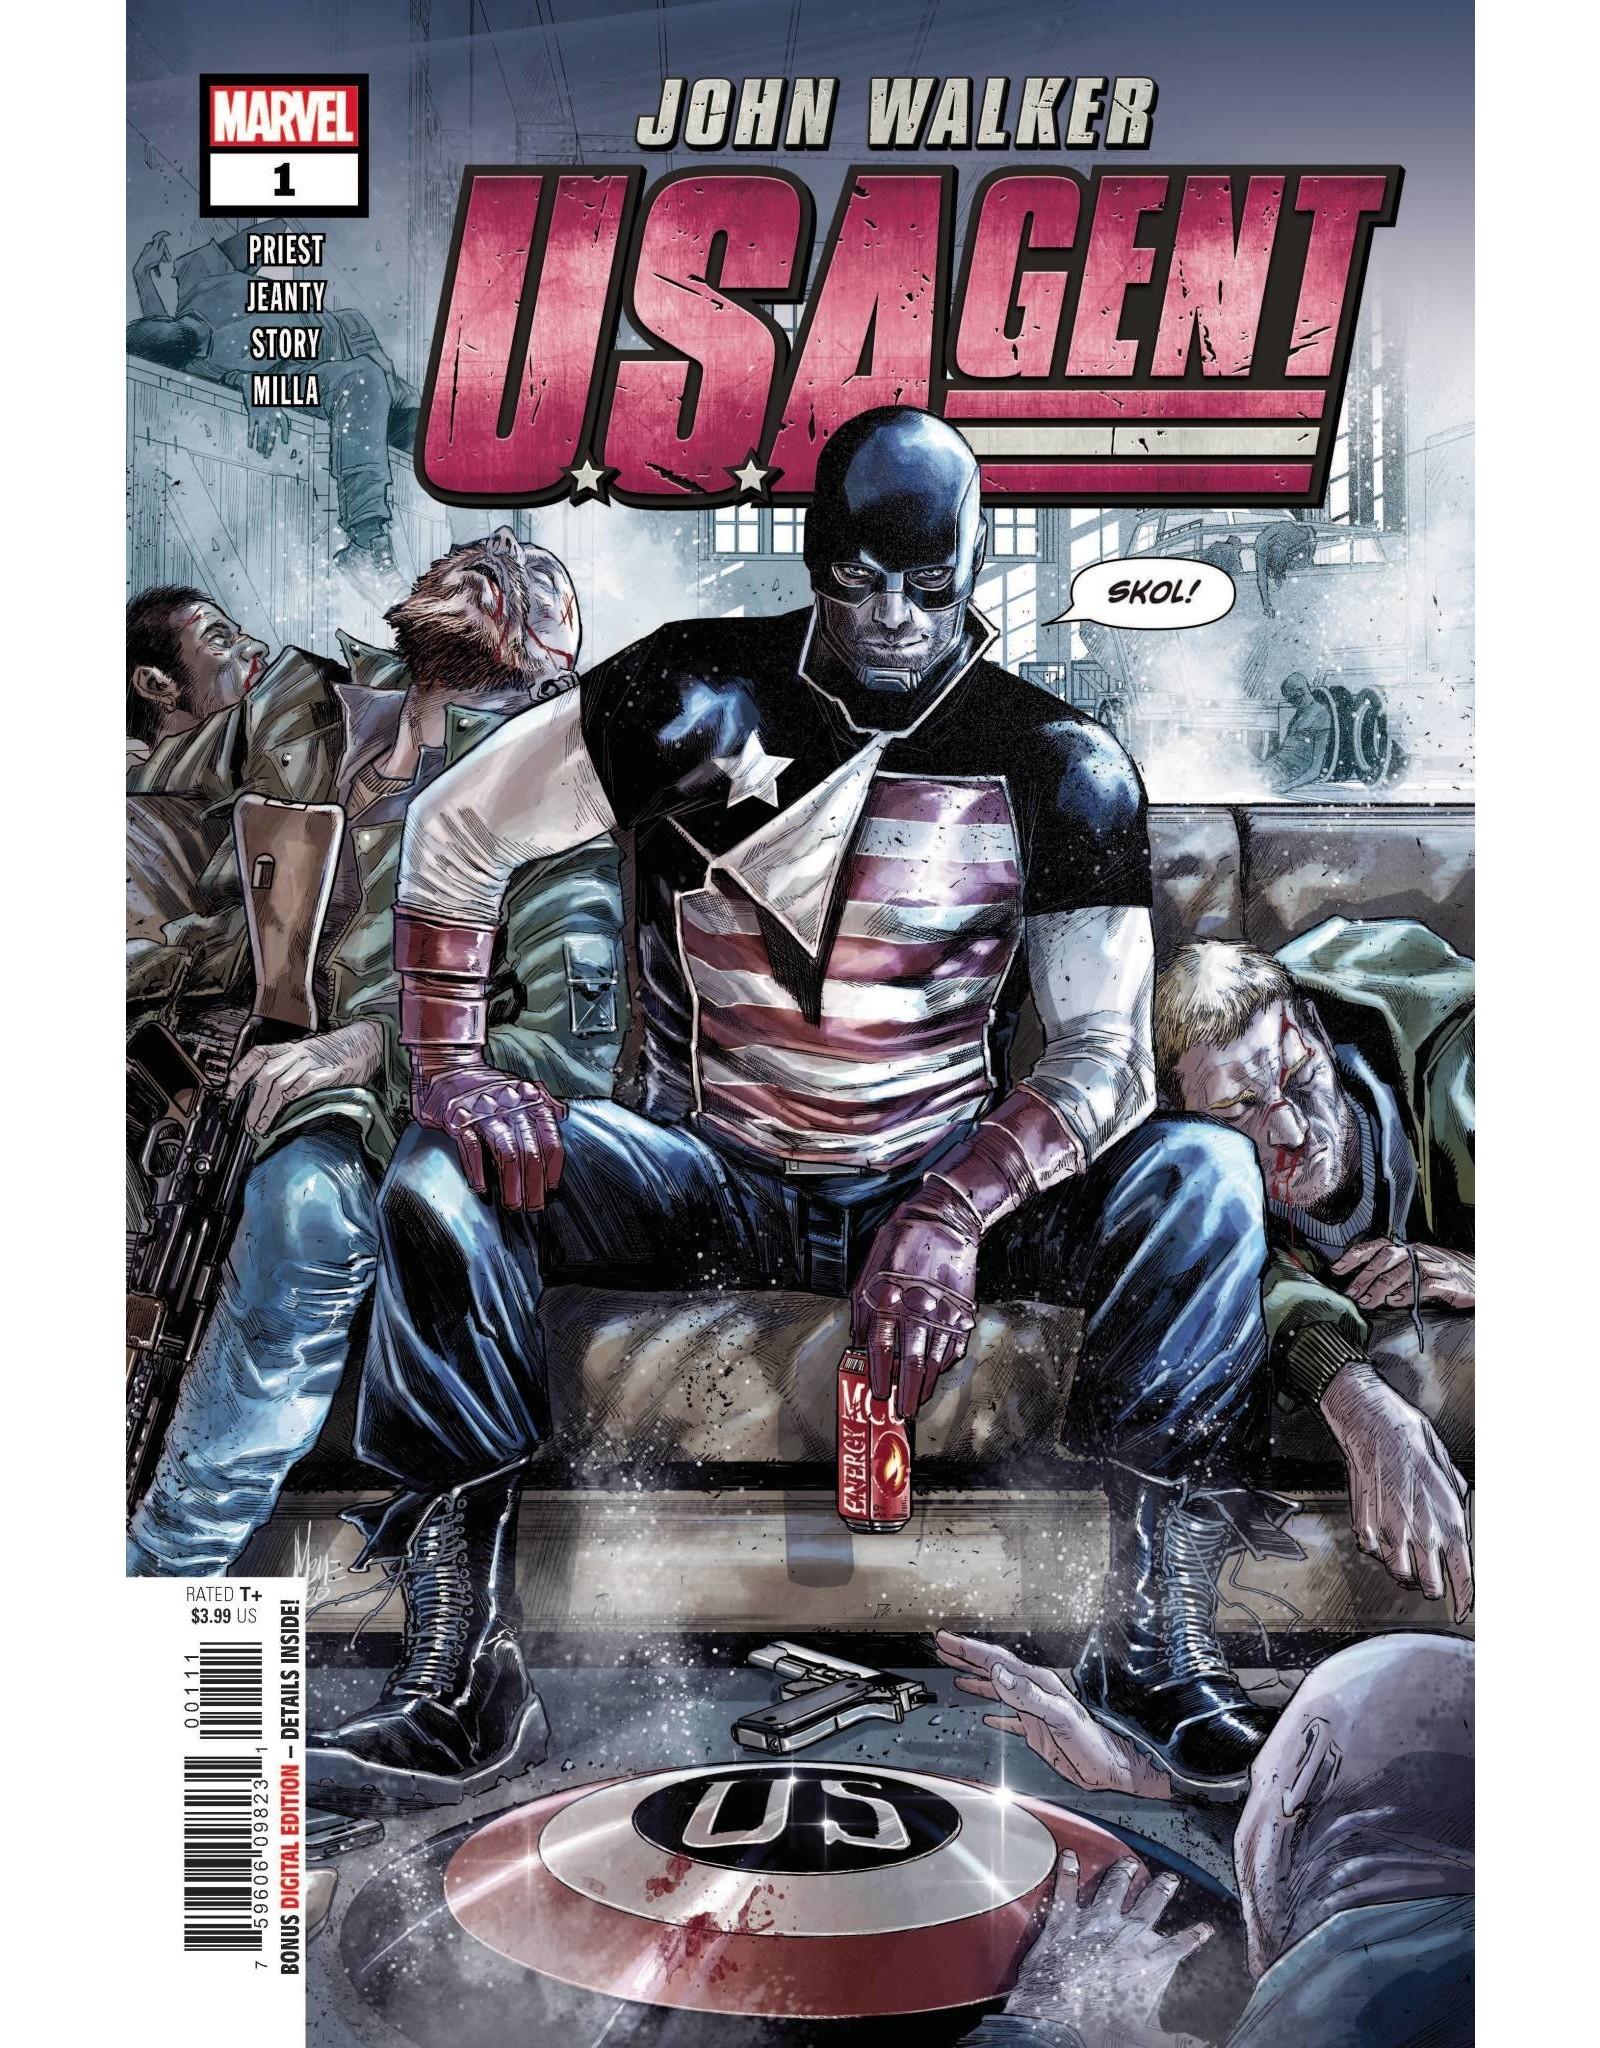 Marvel Comics US AGENT #1 (OF 5)